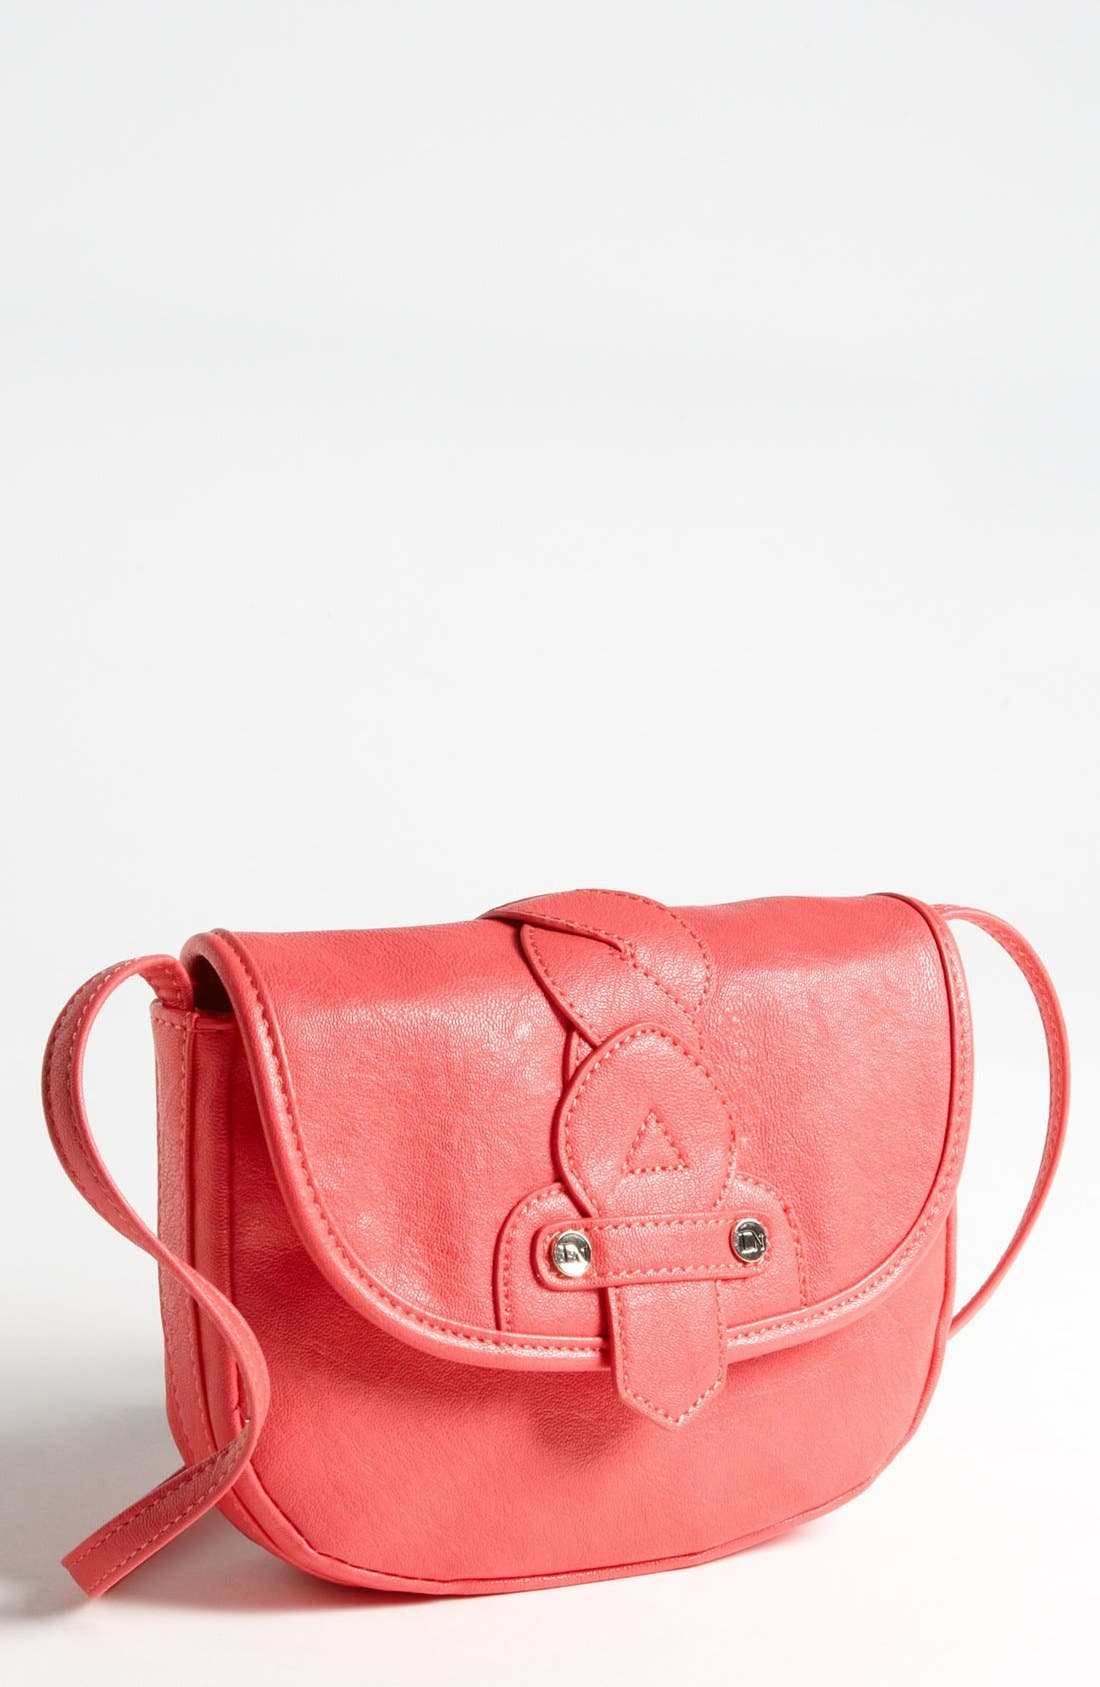 Alternate Image 1 Selected - Danielle Nicole 'Nola' Faux Leather Crossbody Bag